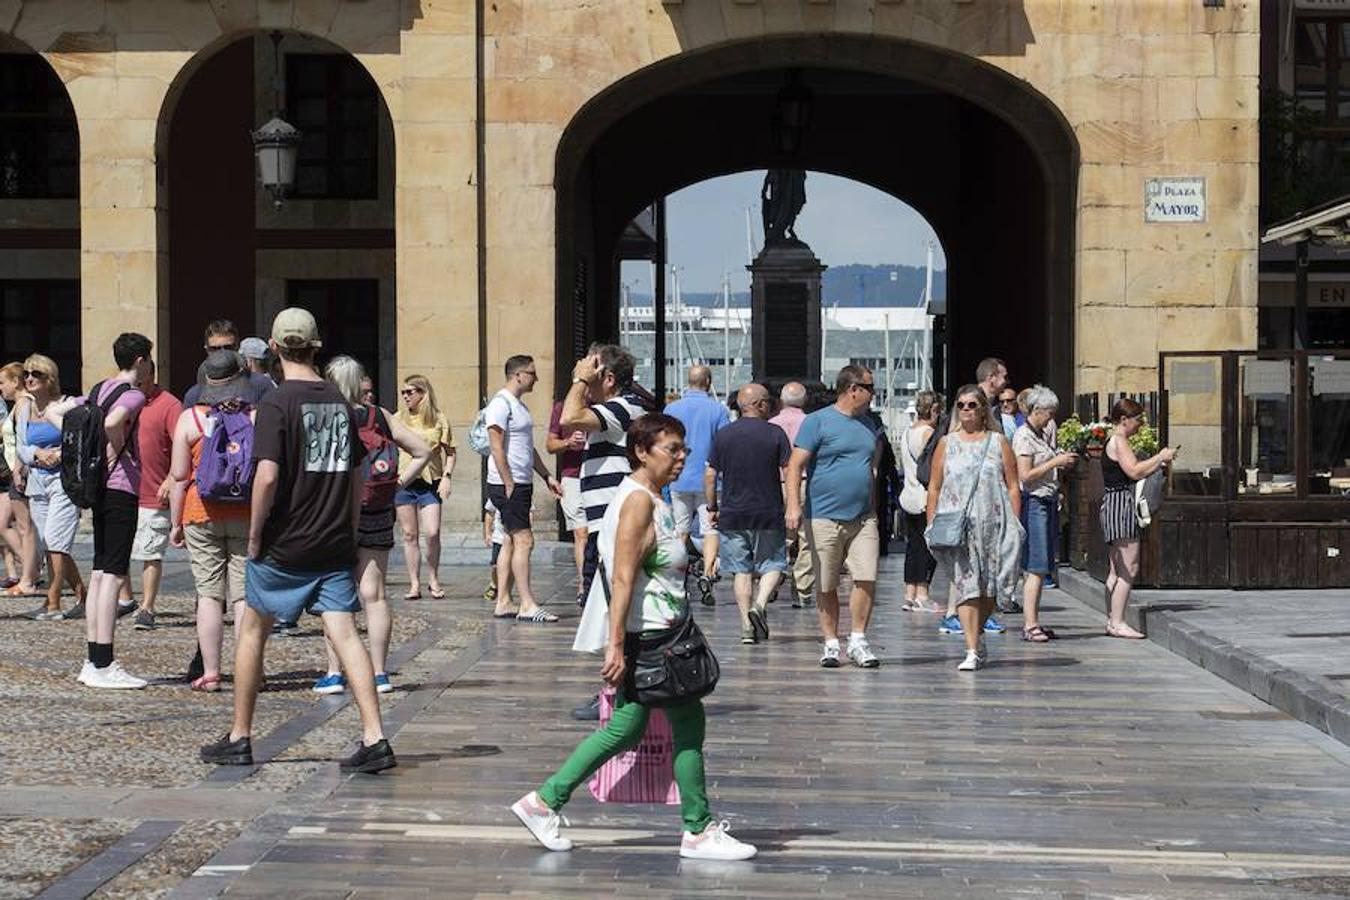 Jornada de calor en Asturias pese a la amenaza de tormentas